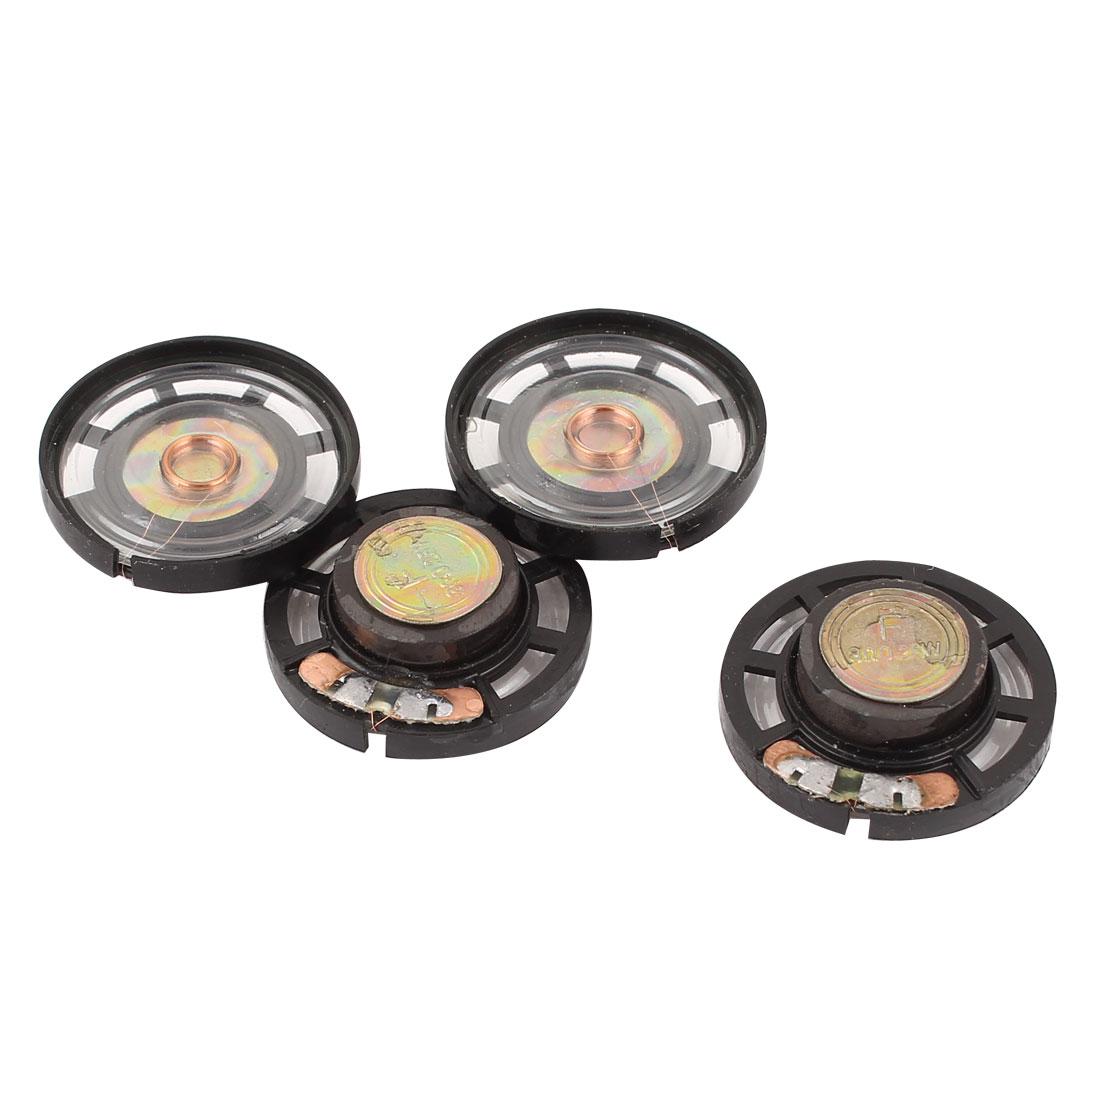 4 Pcs 0.25Watt 8Ohm 28mm Round Metal Shell Magnet Electronic Speaker Loudspeaker